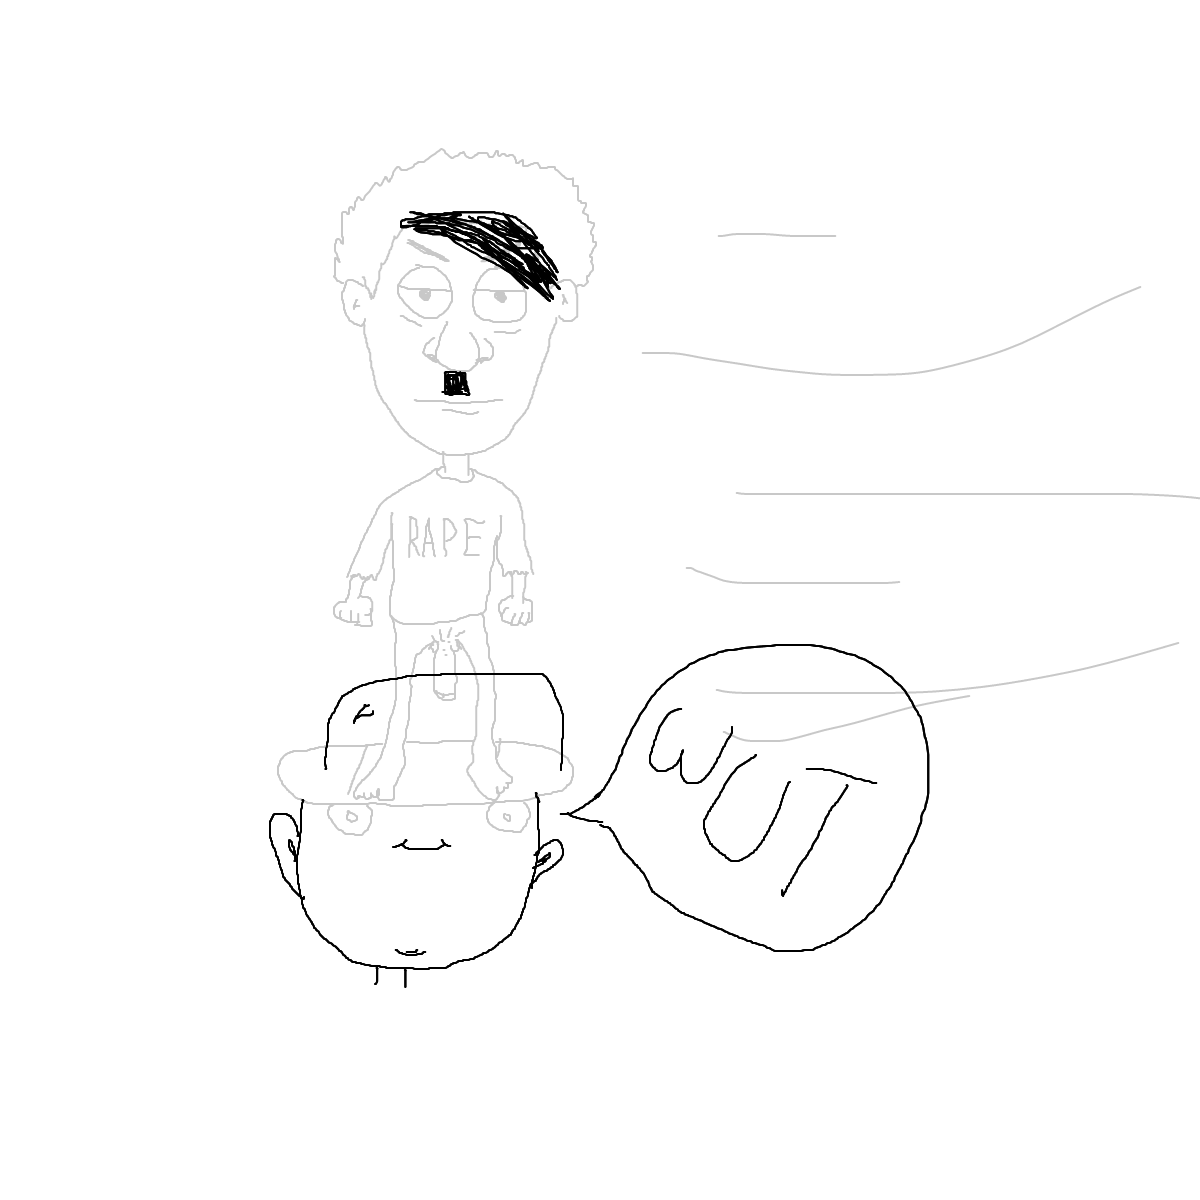 BAAAM drawing#2628 lat:-45.0426292419433600lng: 169.1999969482422000